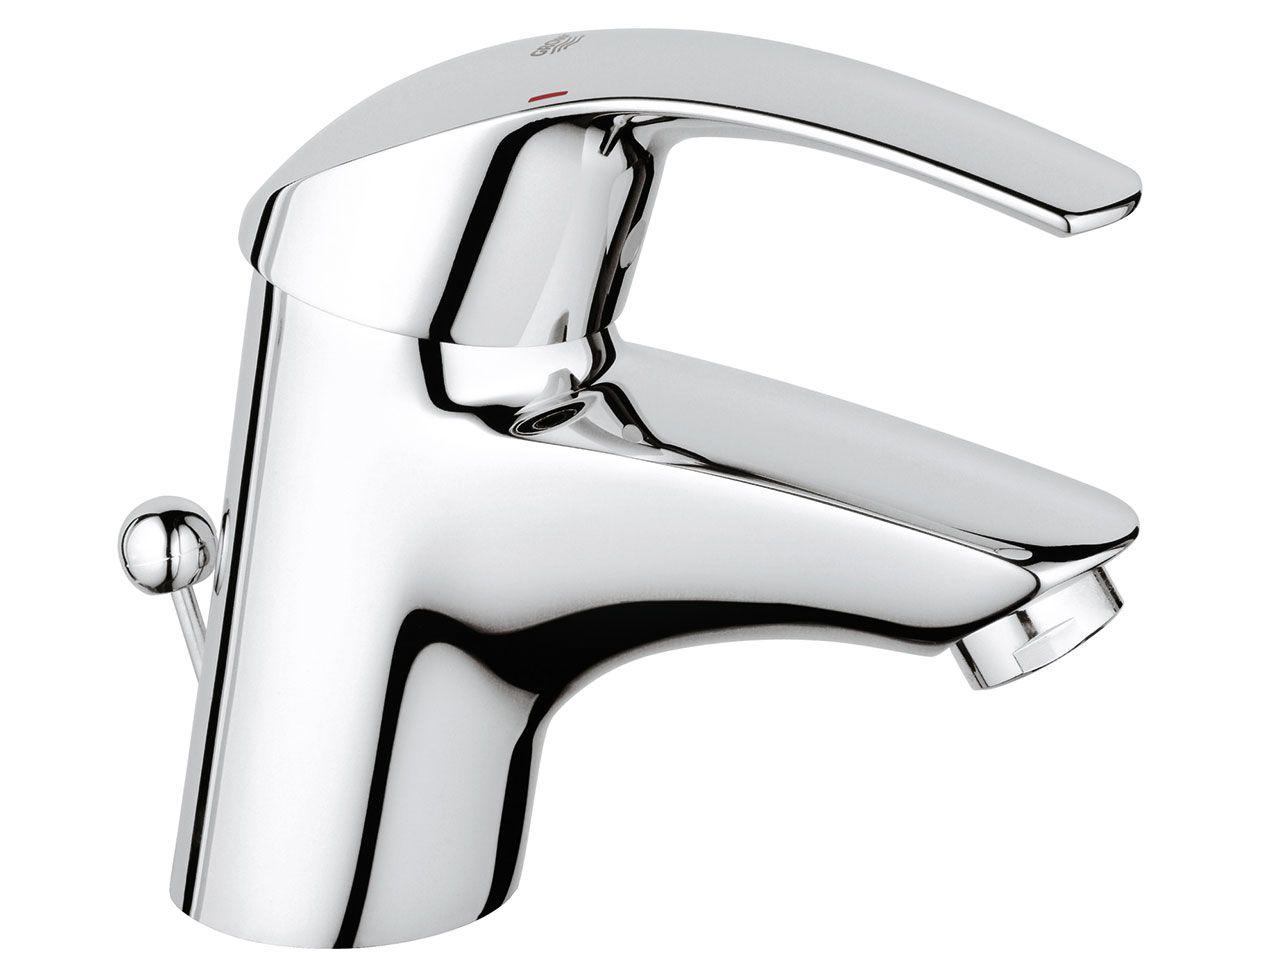 Grohe eurosmart mix lavabo cromo iperceramica rubinetti bagno